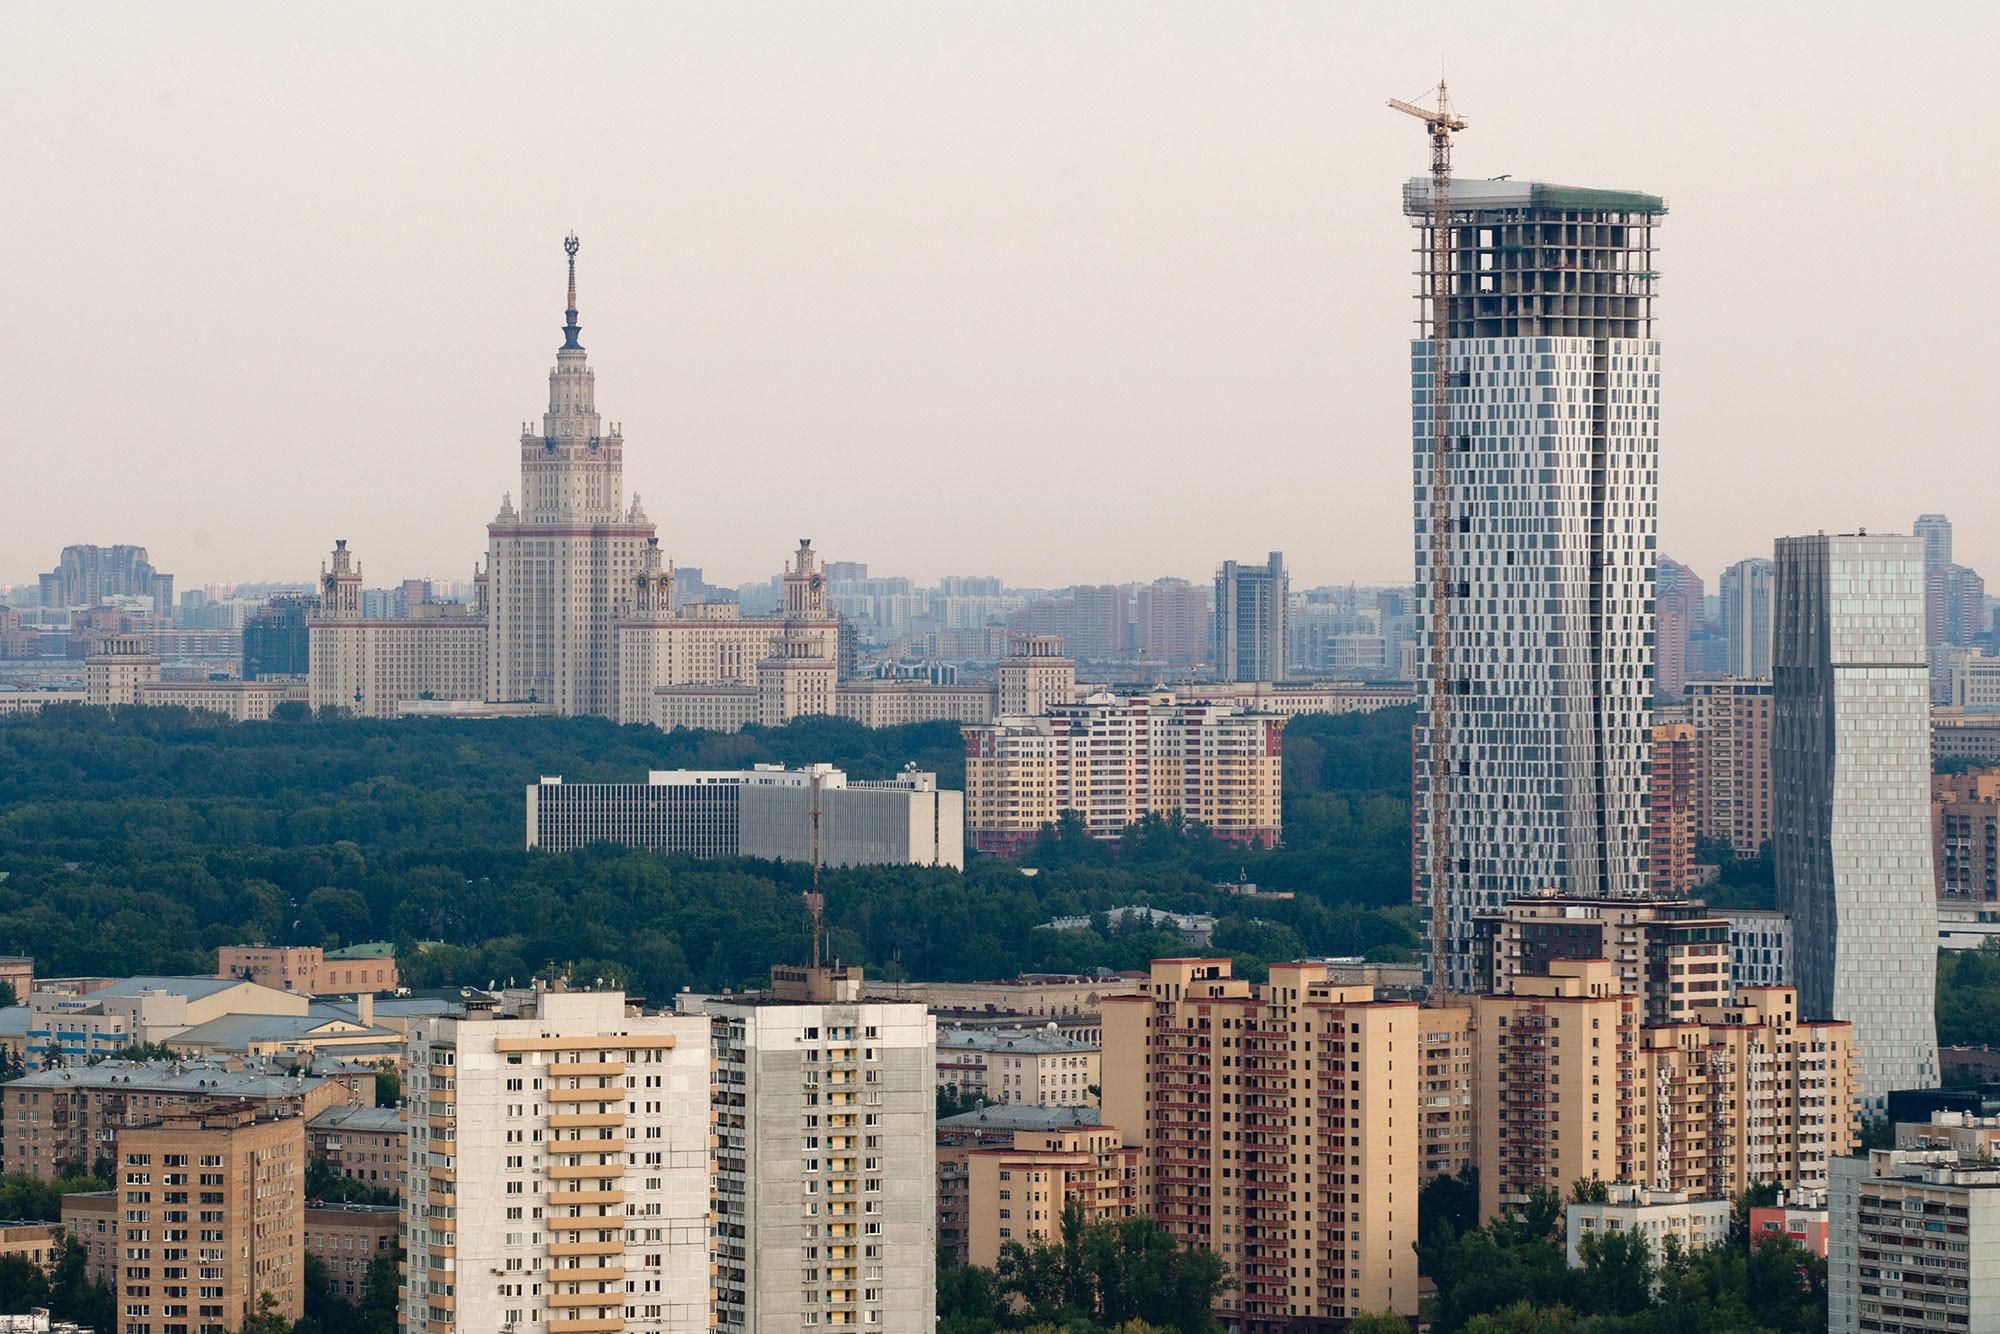 Фото: © РИА Новости / Антон Белицкий